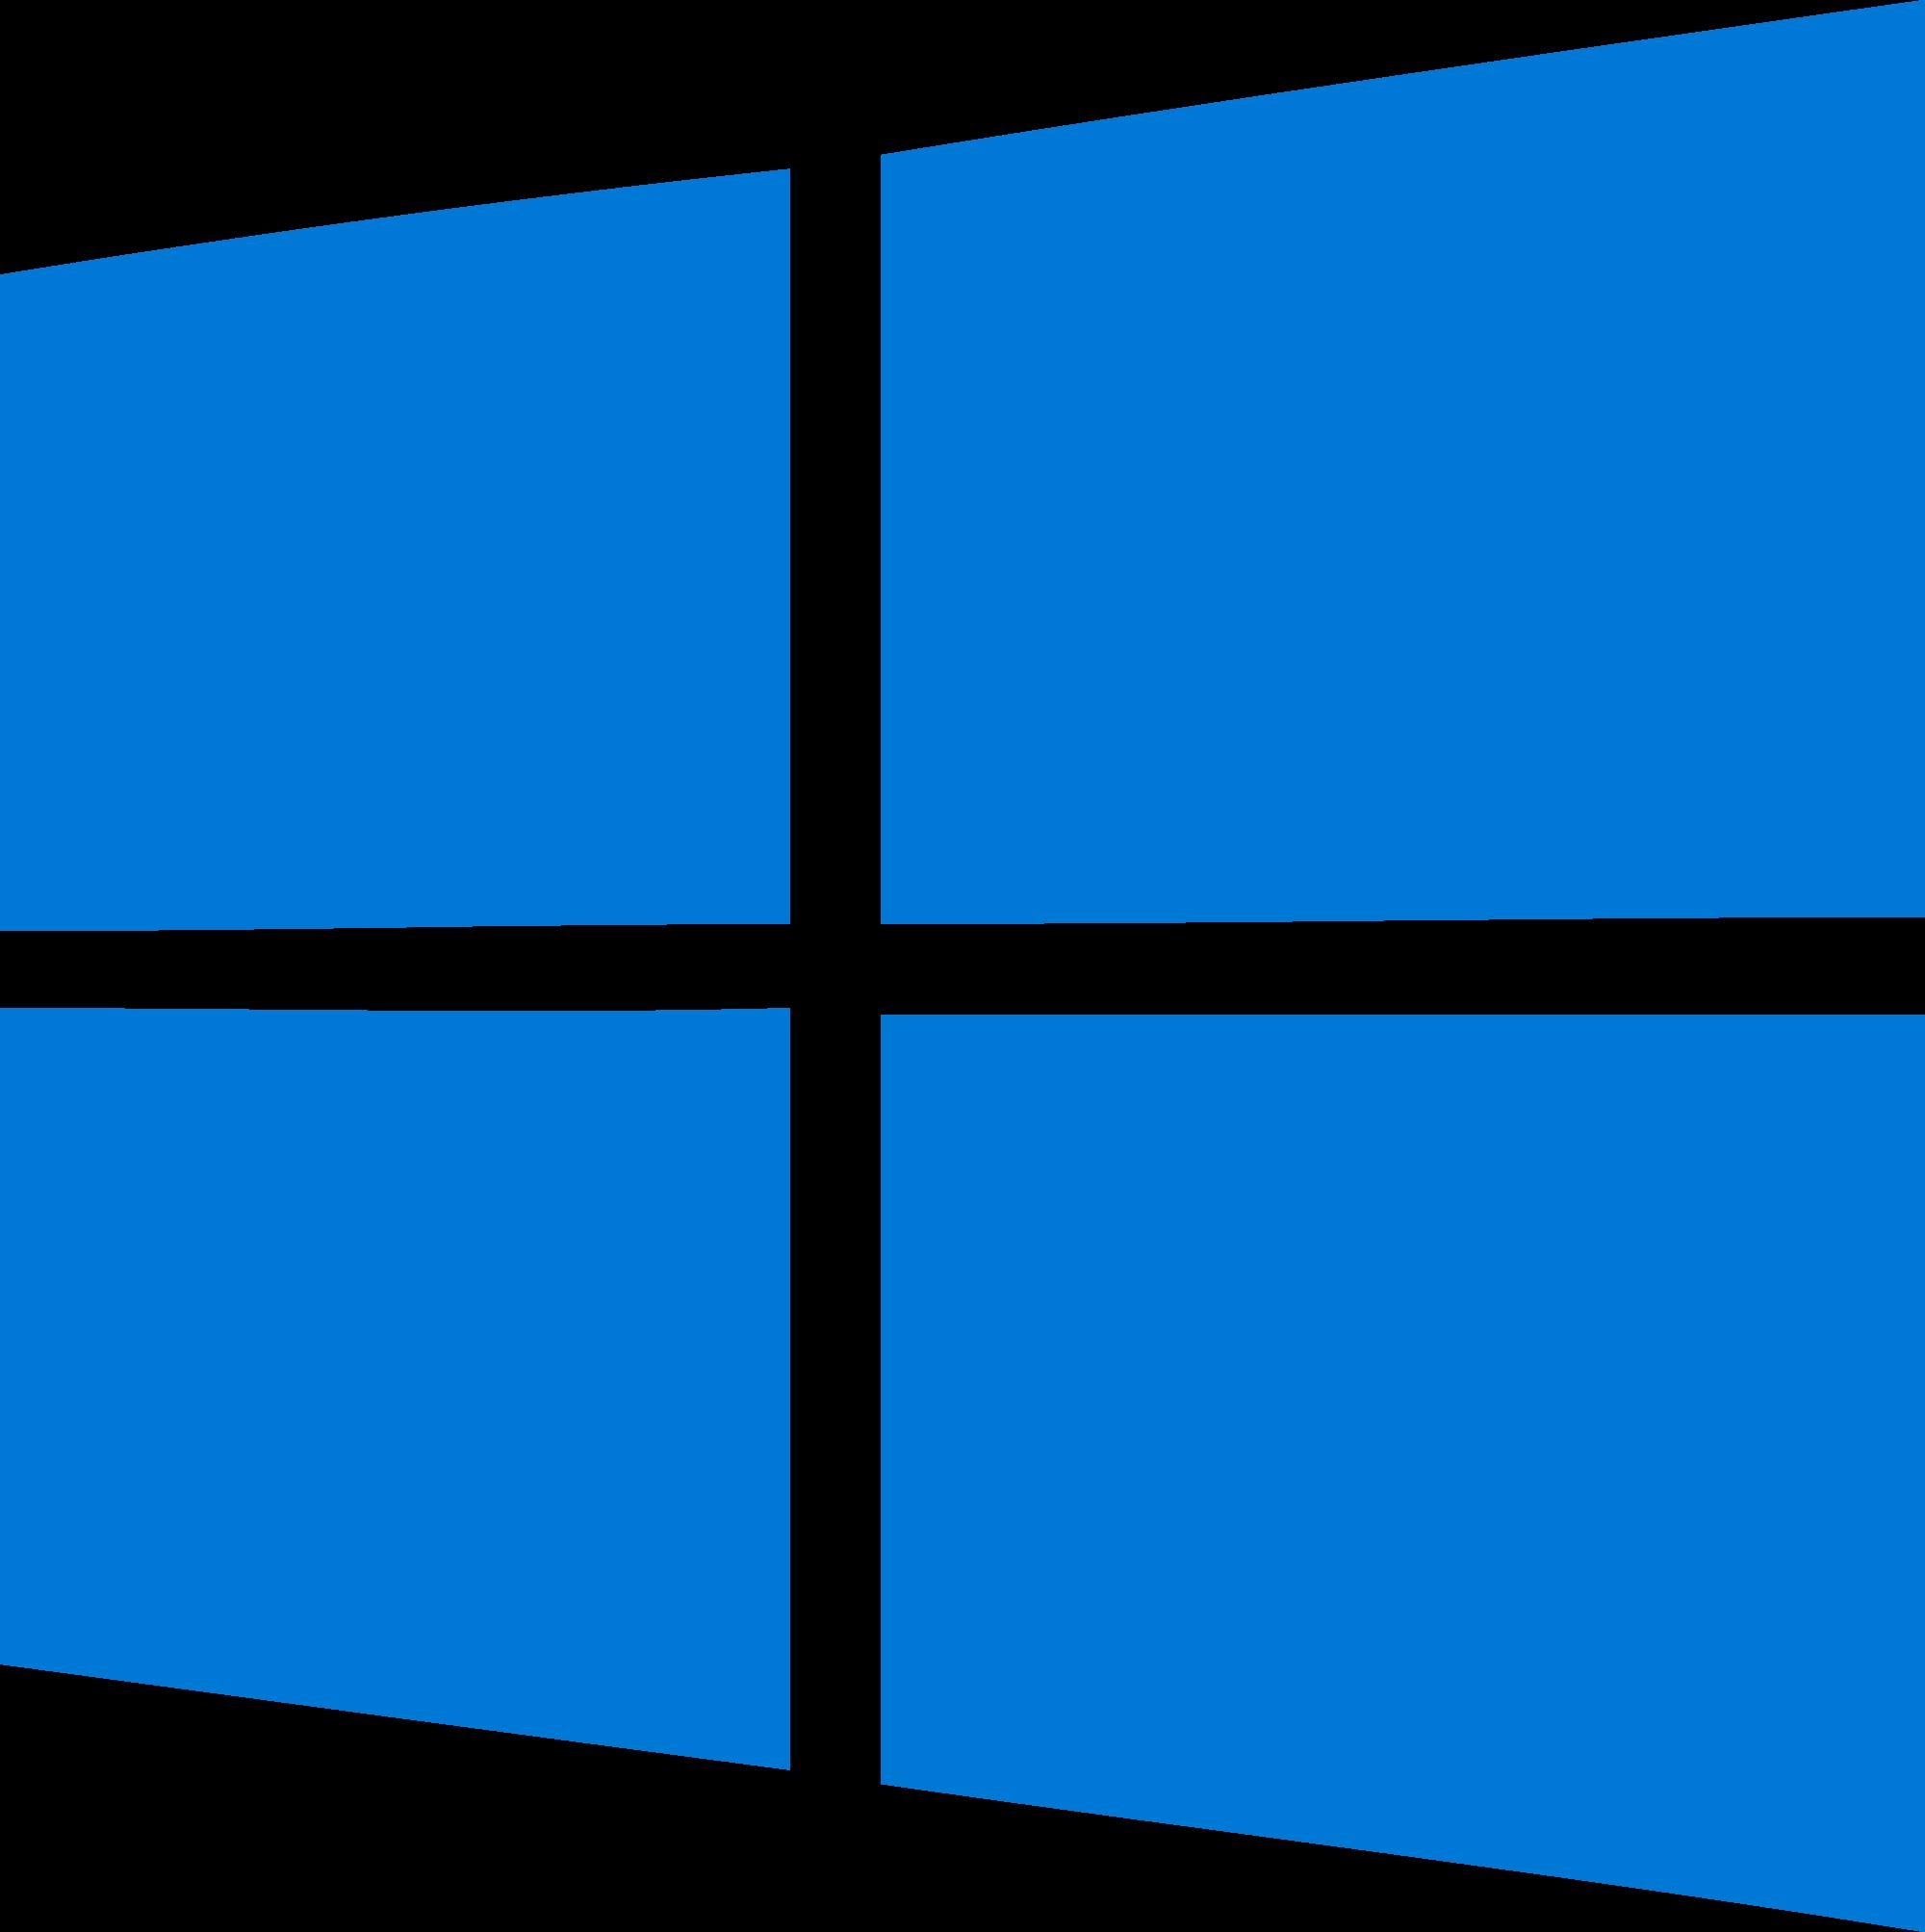 Svg to png windows. Image logo dark blue